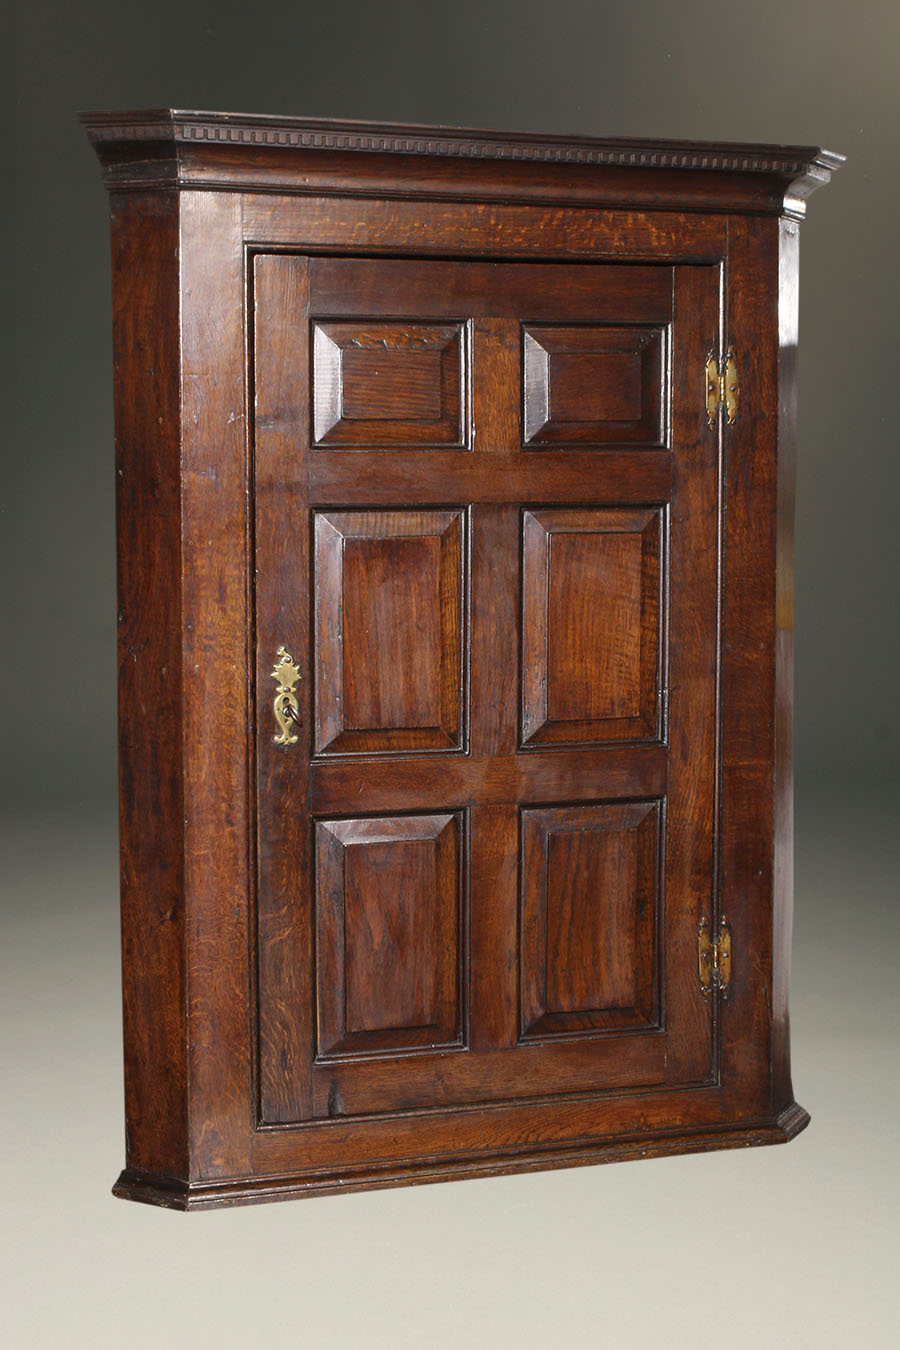 Home/Furniture/Cupboards. 18th century English oak hanging corner cupboard. - Antique English Hanging Corner Cupboard In Oak.